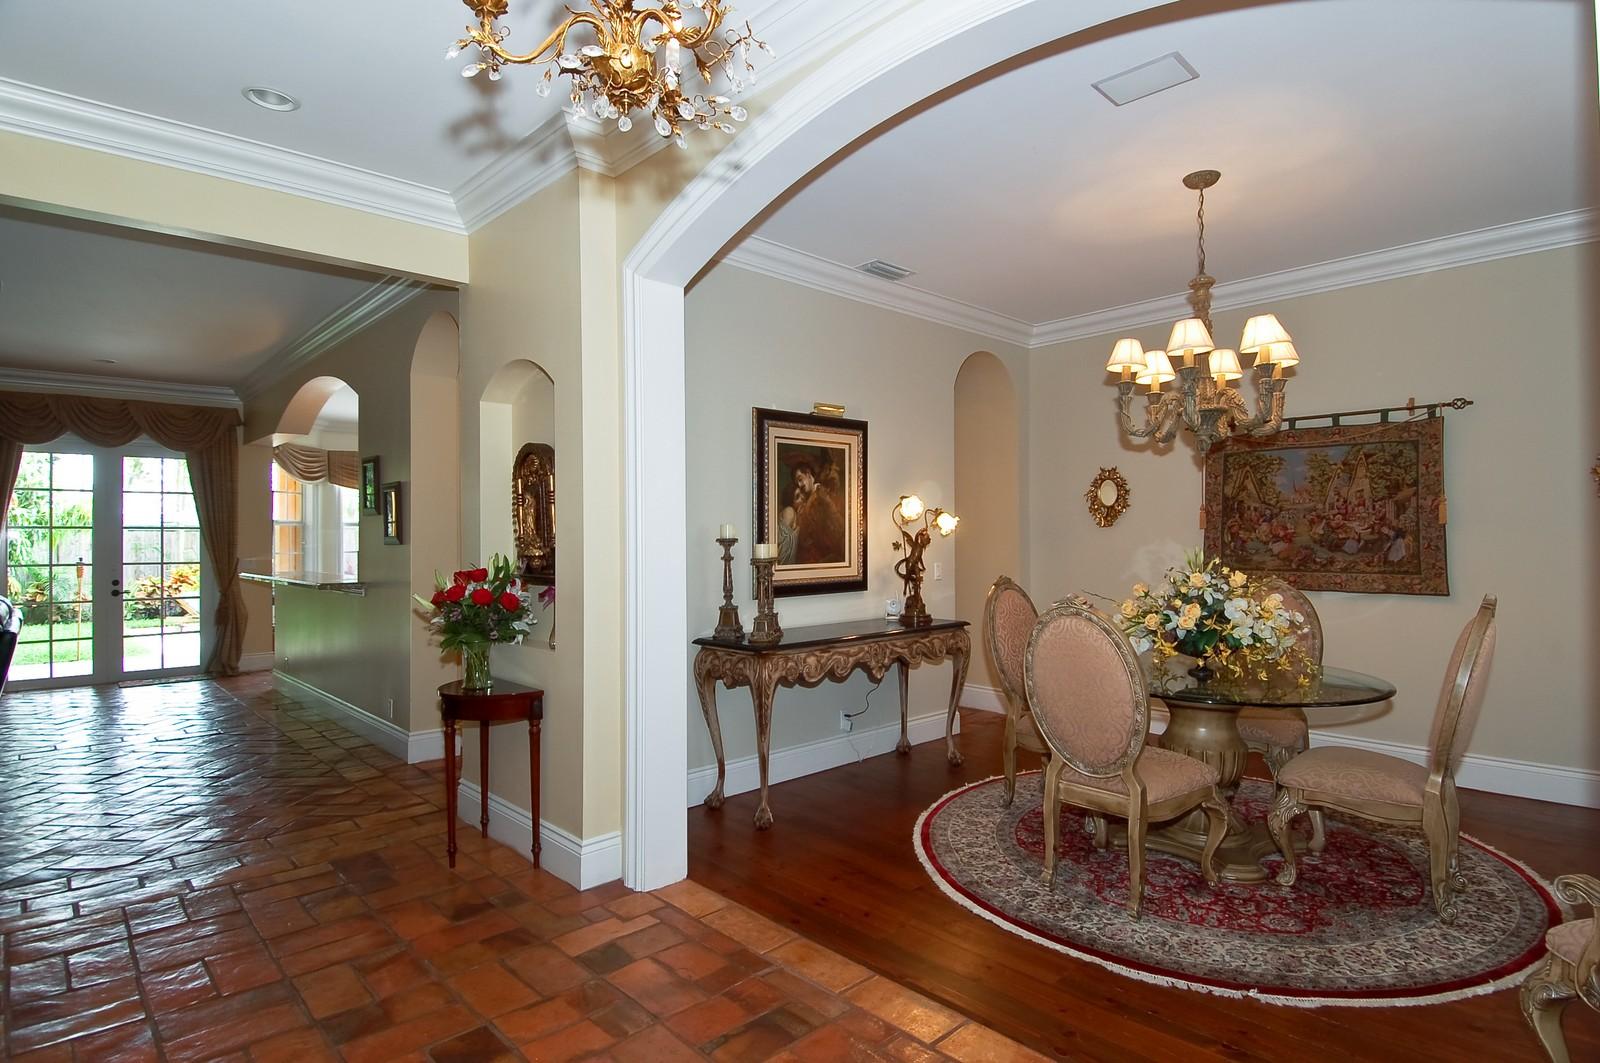 Real Estate Photography - 355 NE 3rd Ct, Boca Raton, FL, 33432 - Foyer/Dining Room